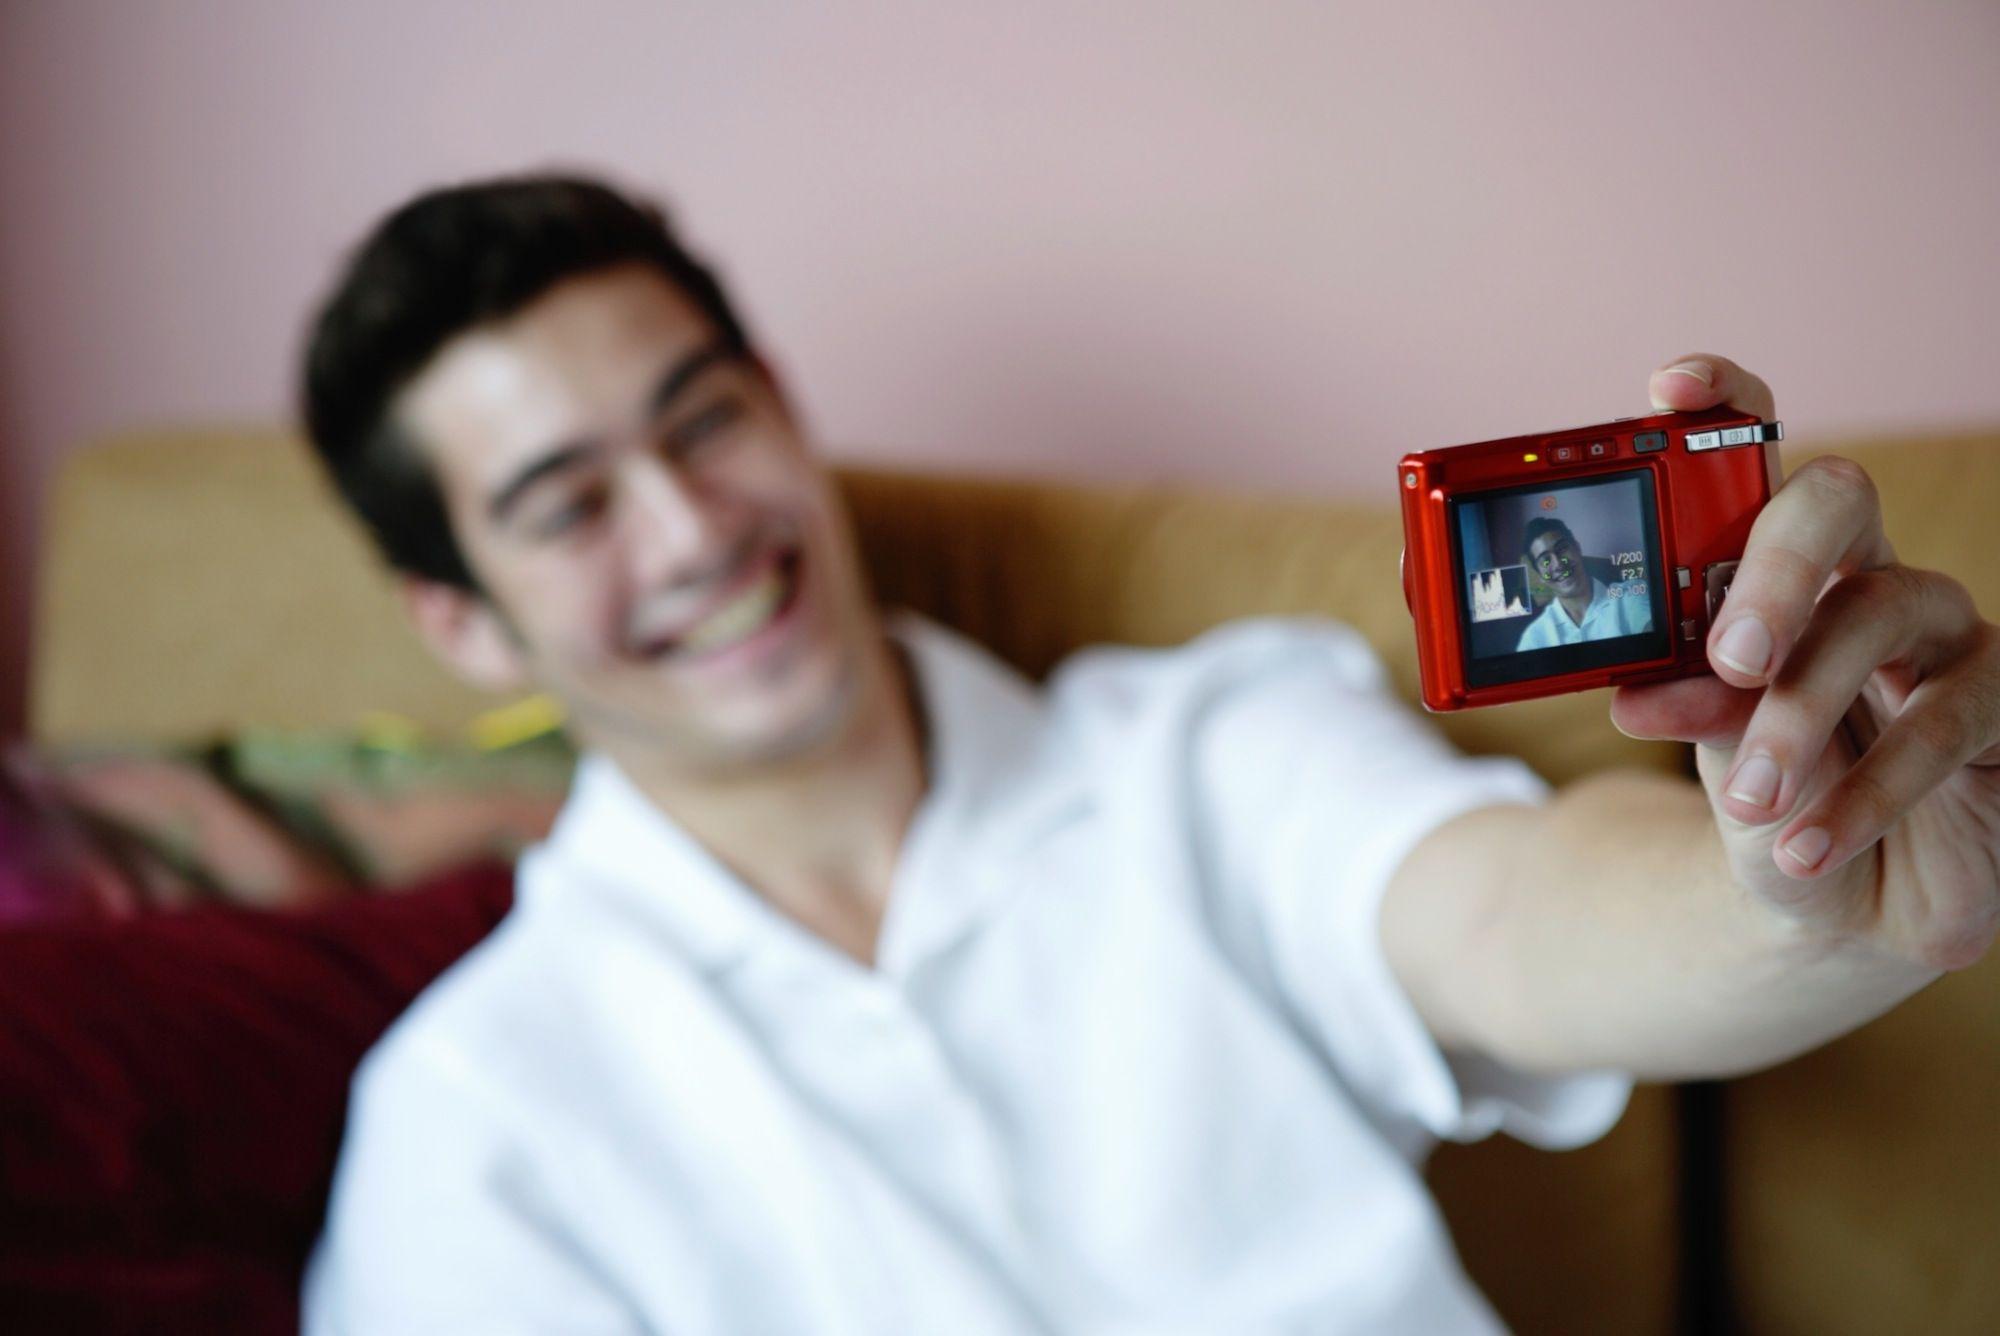 Man holding camera, taking photograph of himself